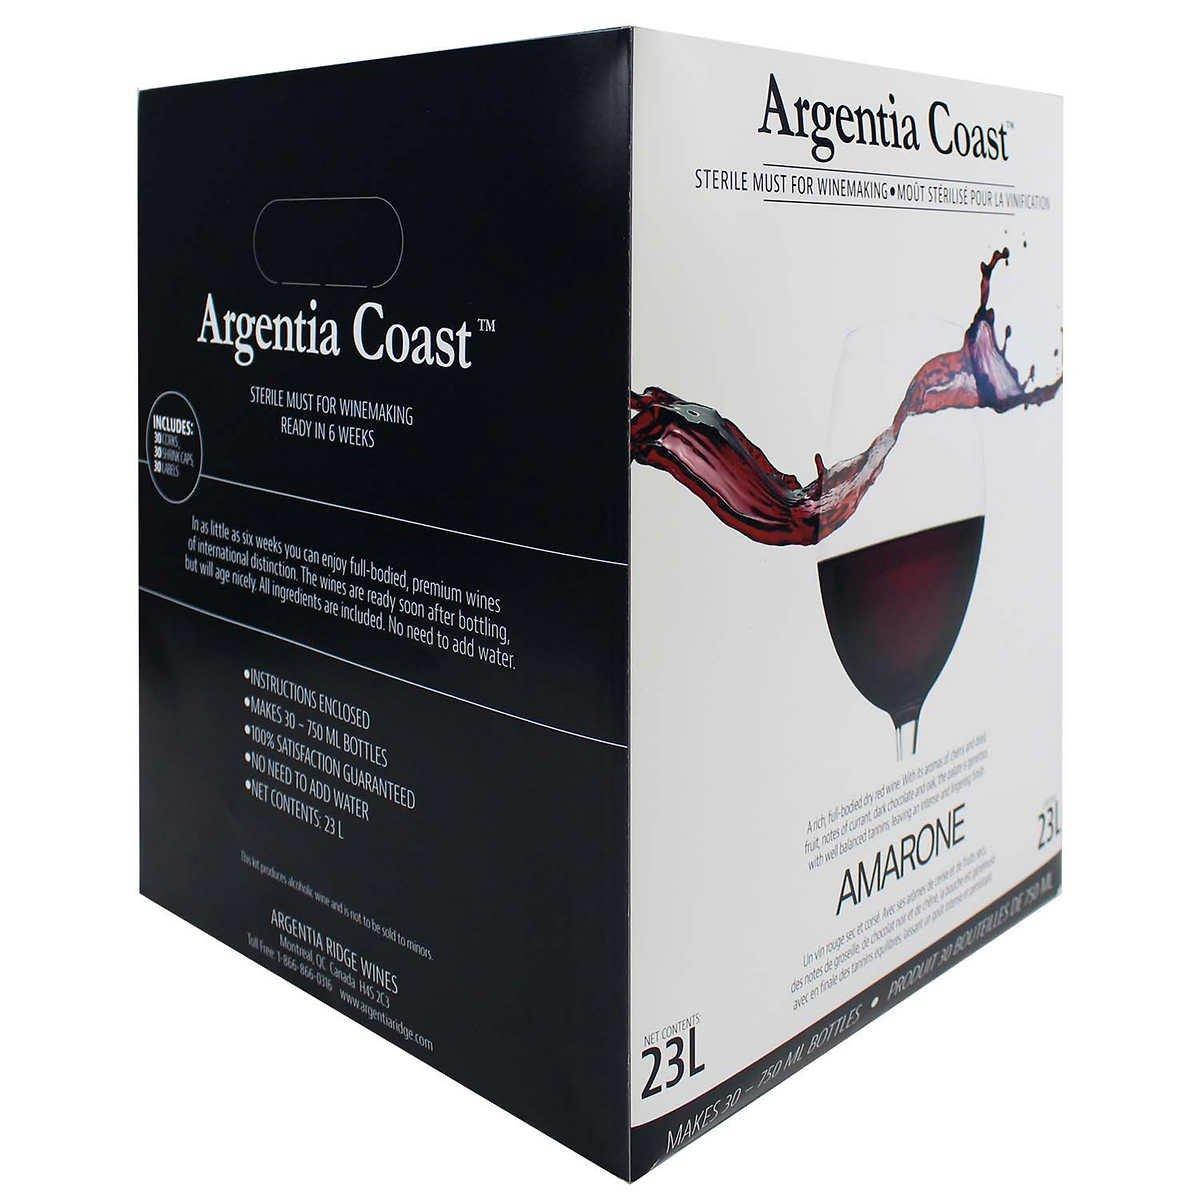 Argentia Ridge Coast Reserve Amarone Red Wine Kit